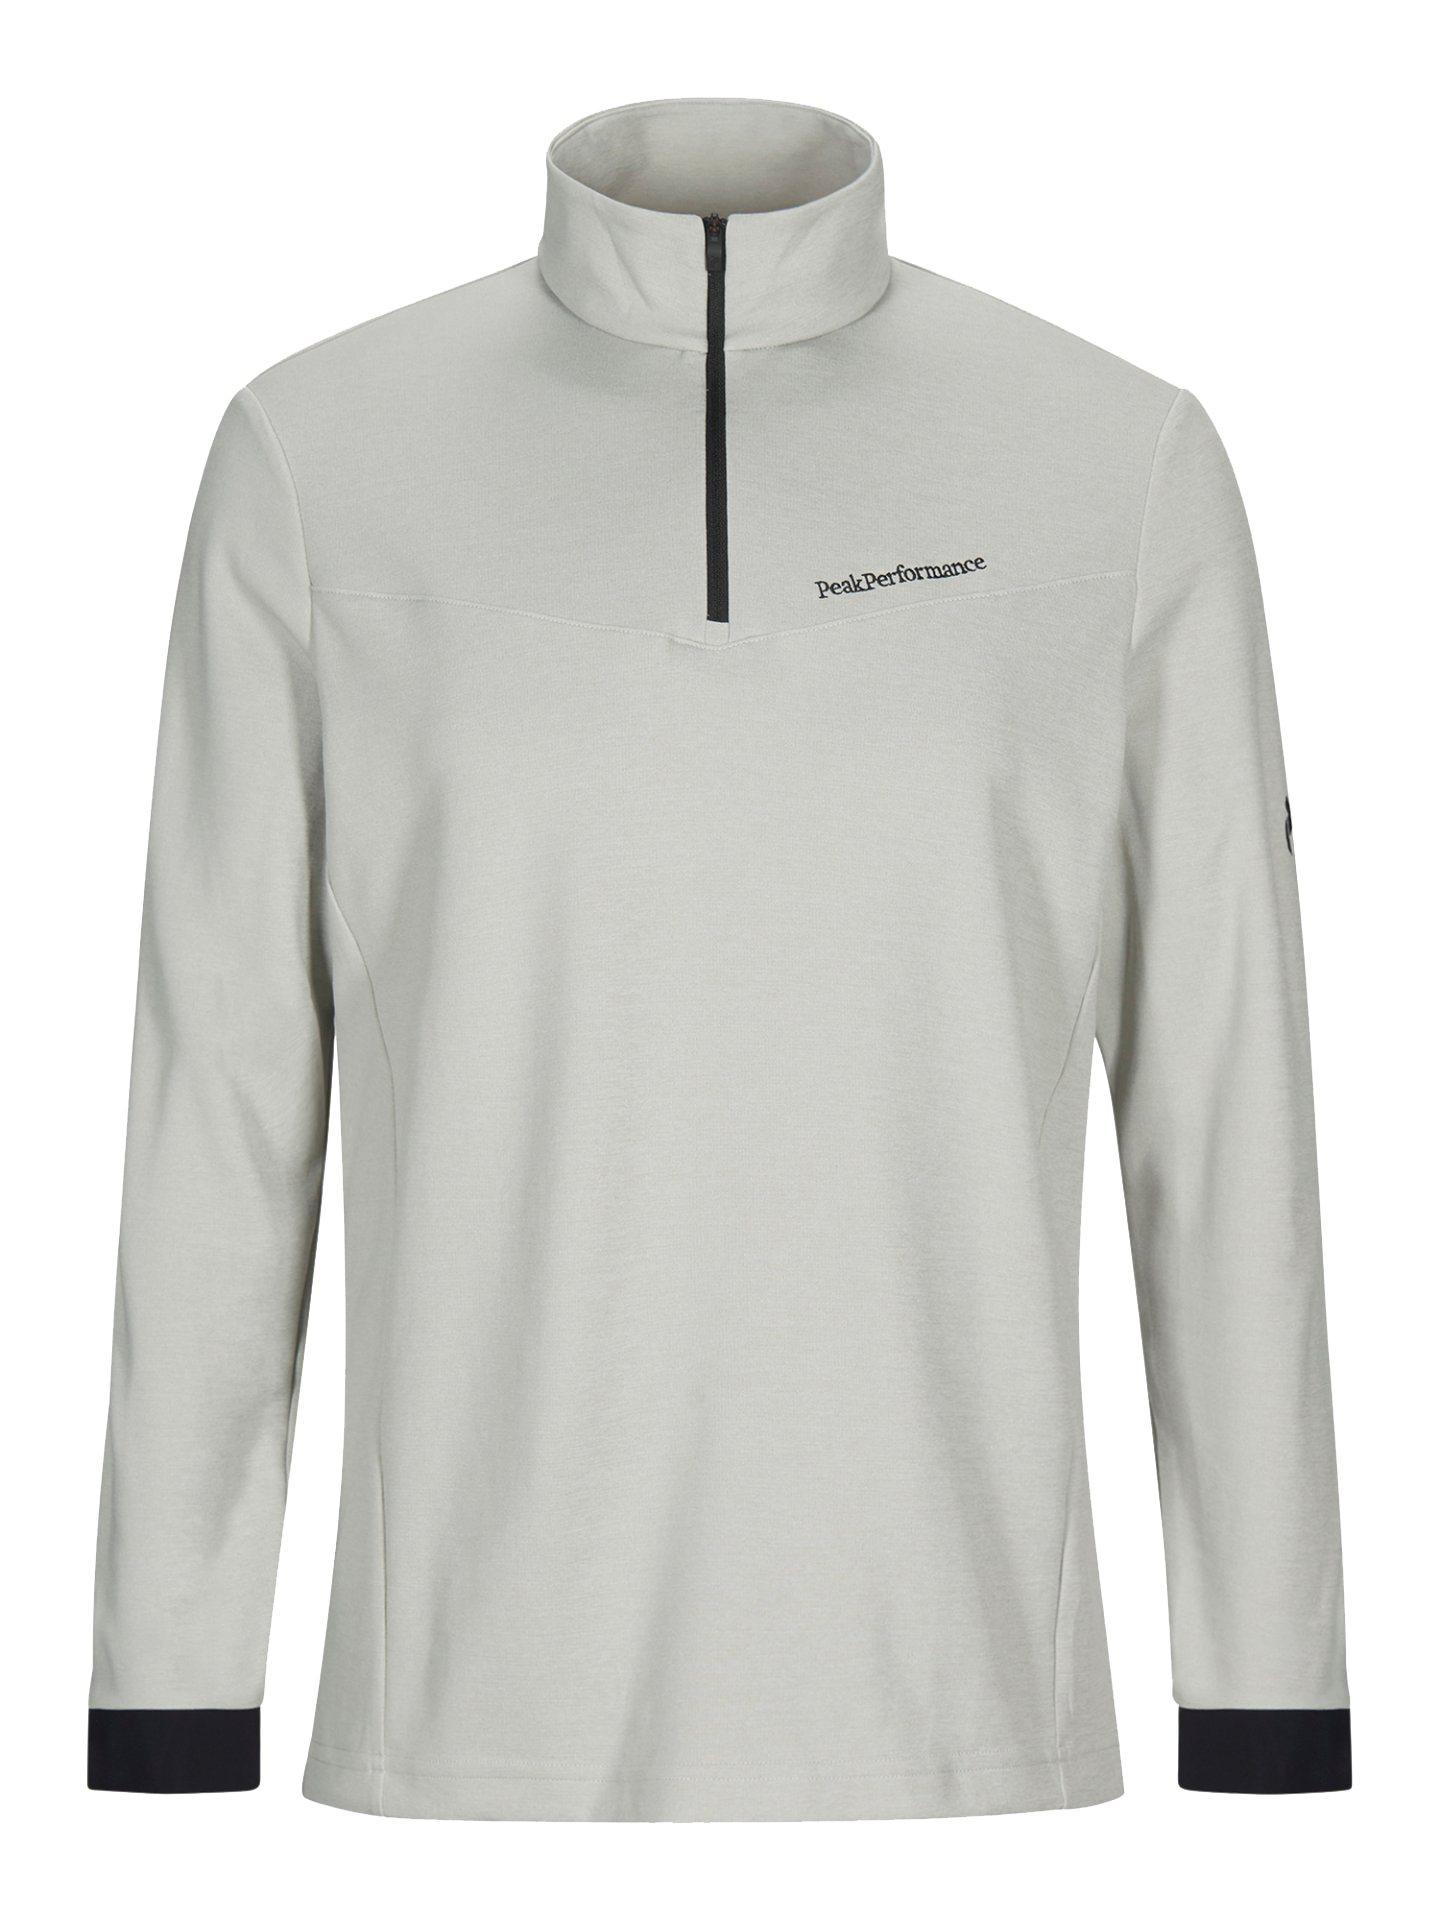 Peak Performance heren golfsweater Chase grijs